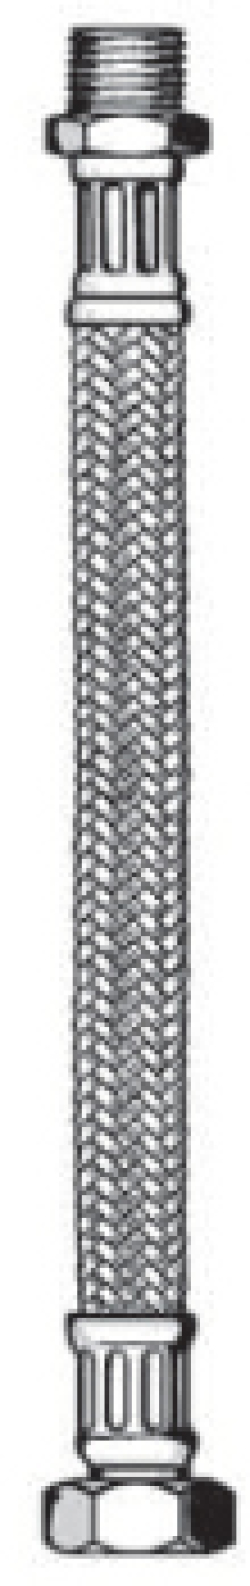 МЕ 5615.1104.60 Meiflex Dn13, 1/2 BPx1/2 HP, 600mm